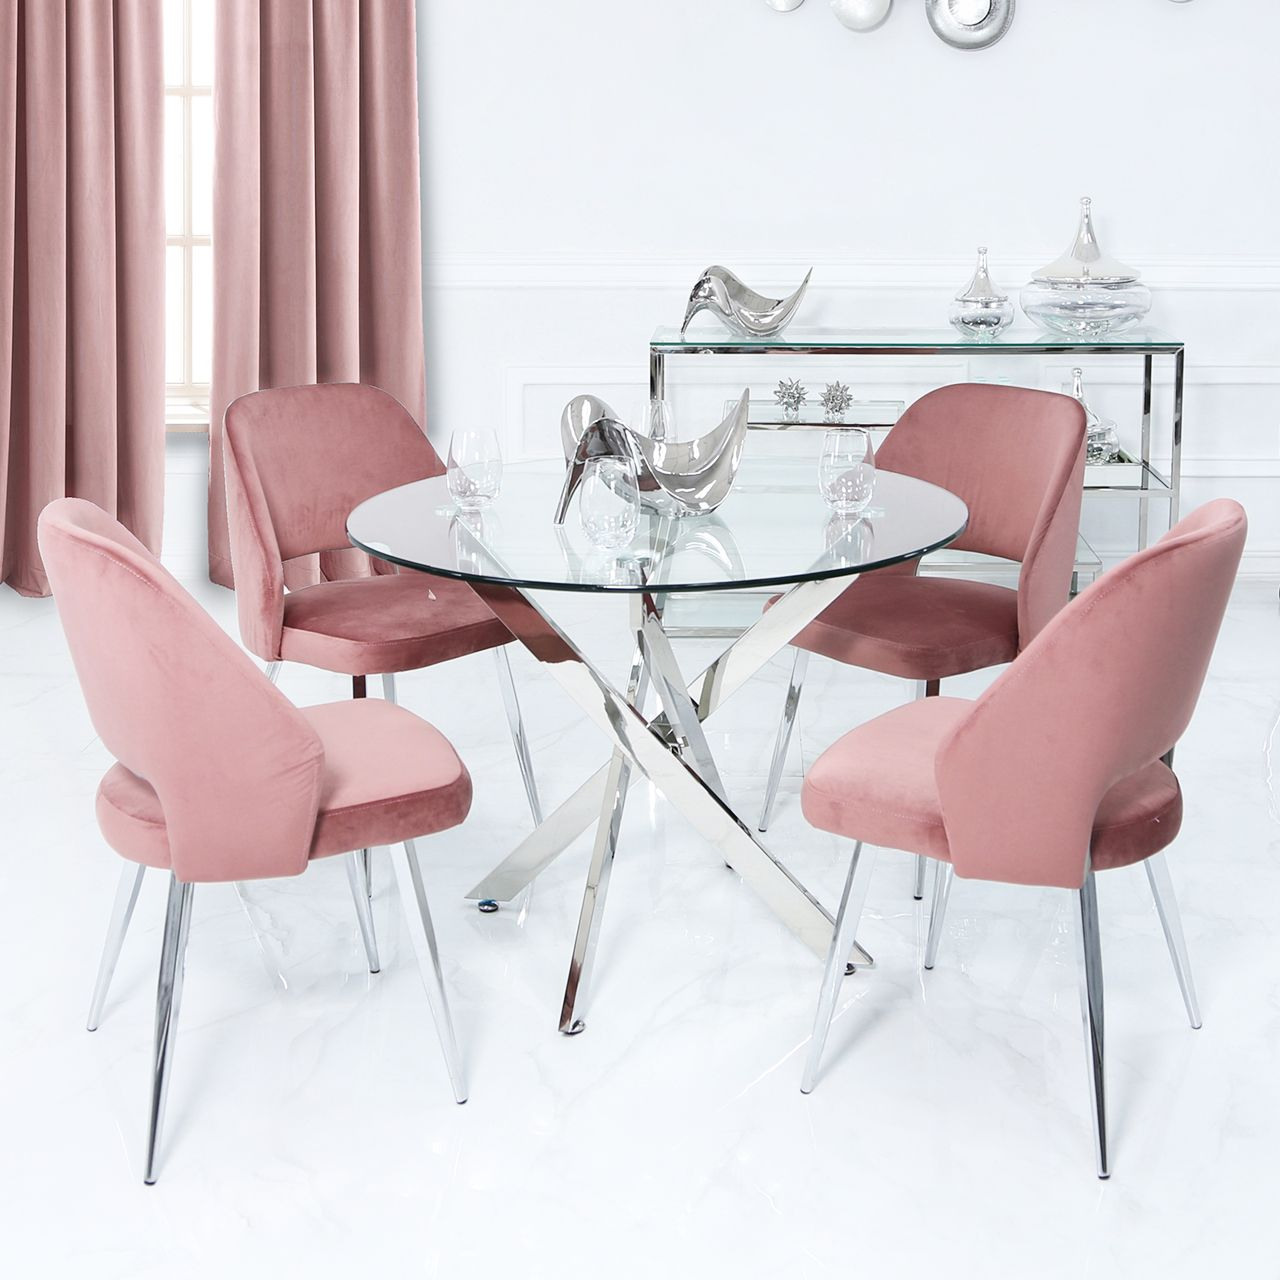 The Nova Dining Table Features A Chrome Crisscross Base With A